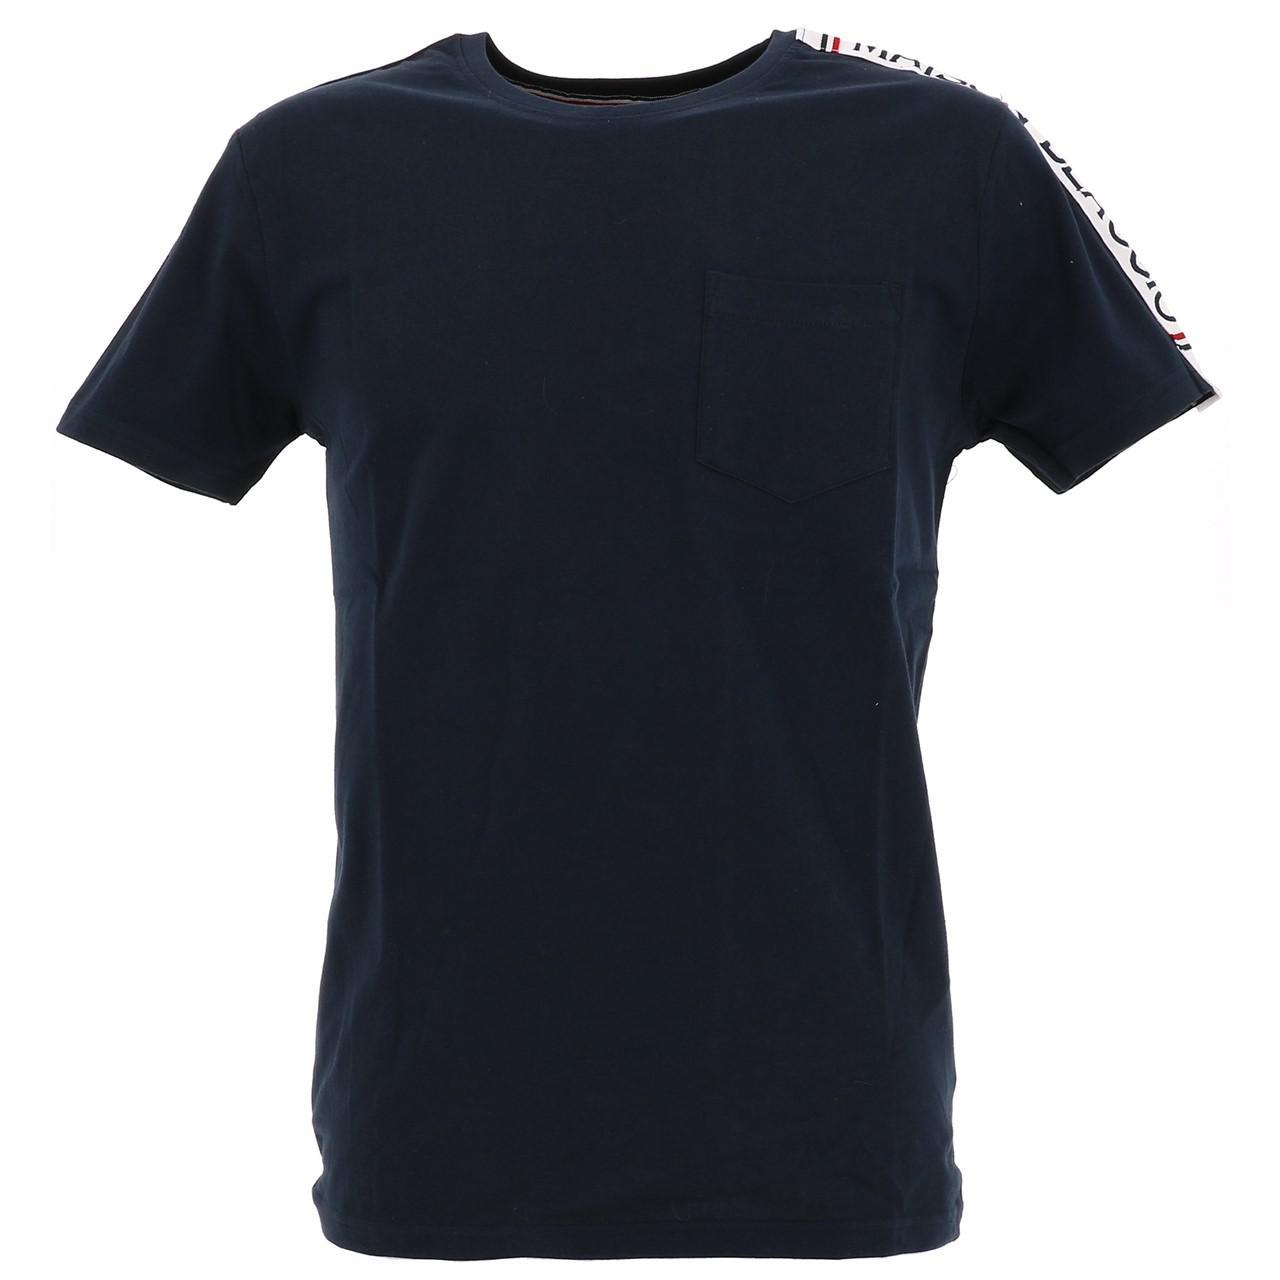 Short-Sleeve-T-Shirt-La-Maison-Blaggio-Metili-Navy-Mc-Tee-Blue-27343-New